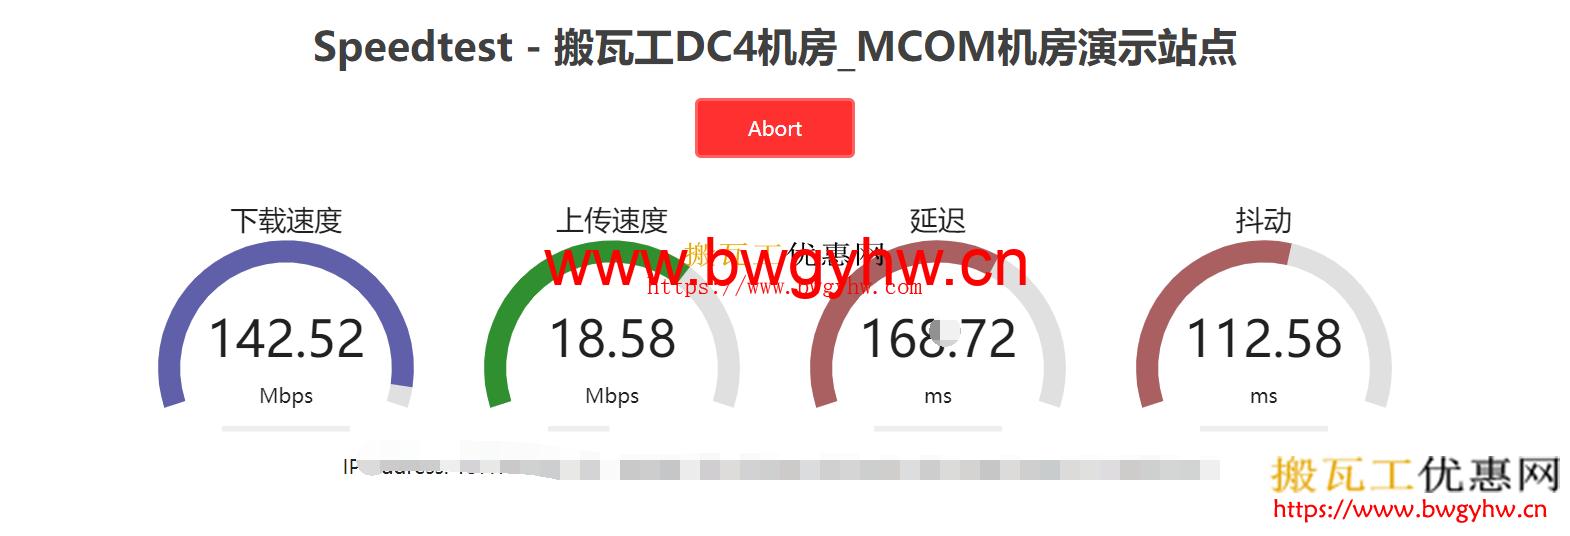 bandwagonhost-dc4-mcom-speedtest